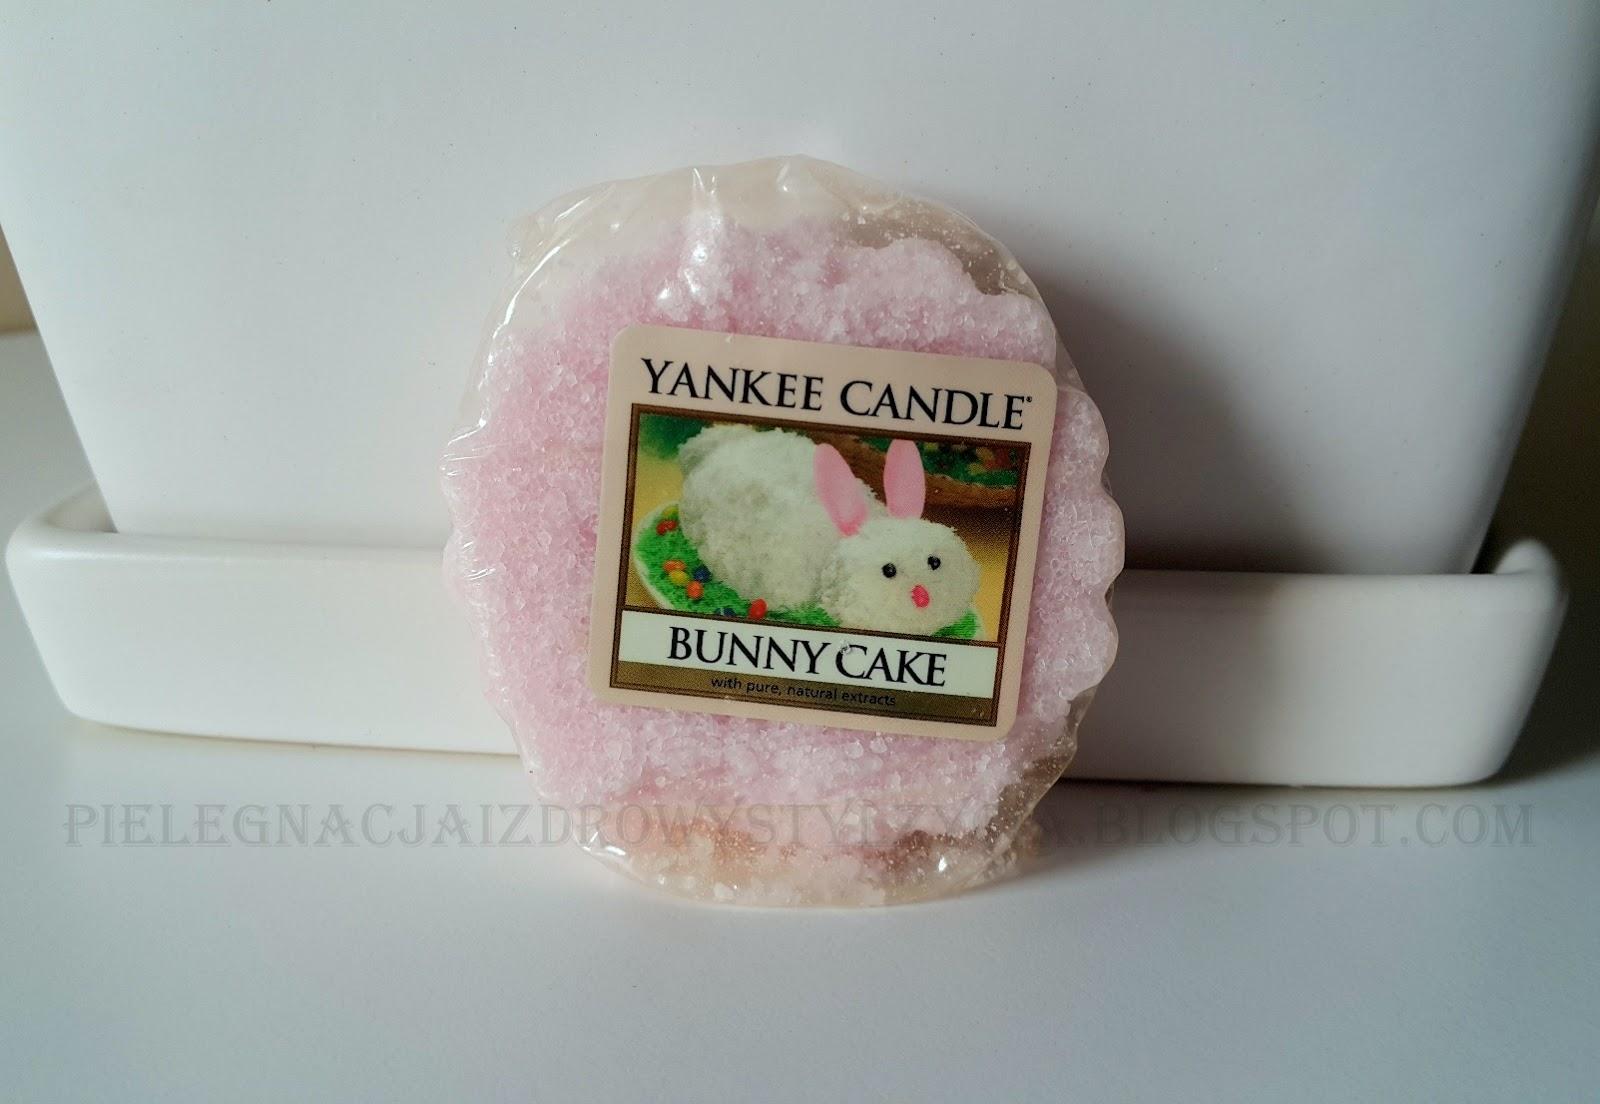 Bunny Cake Yankee Candle